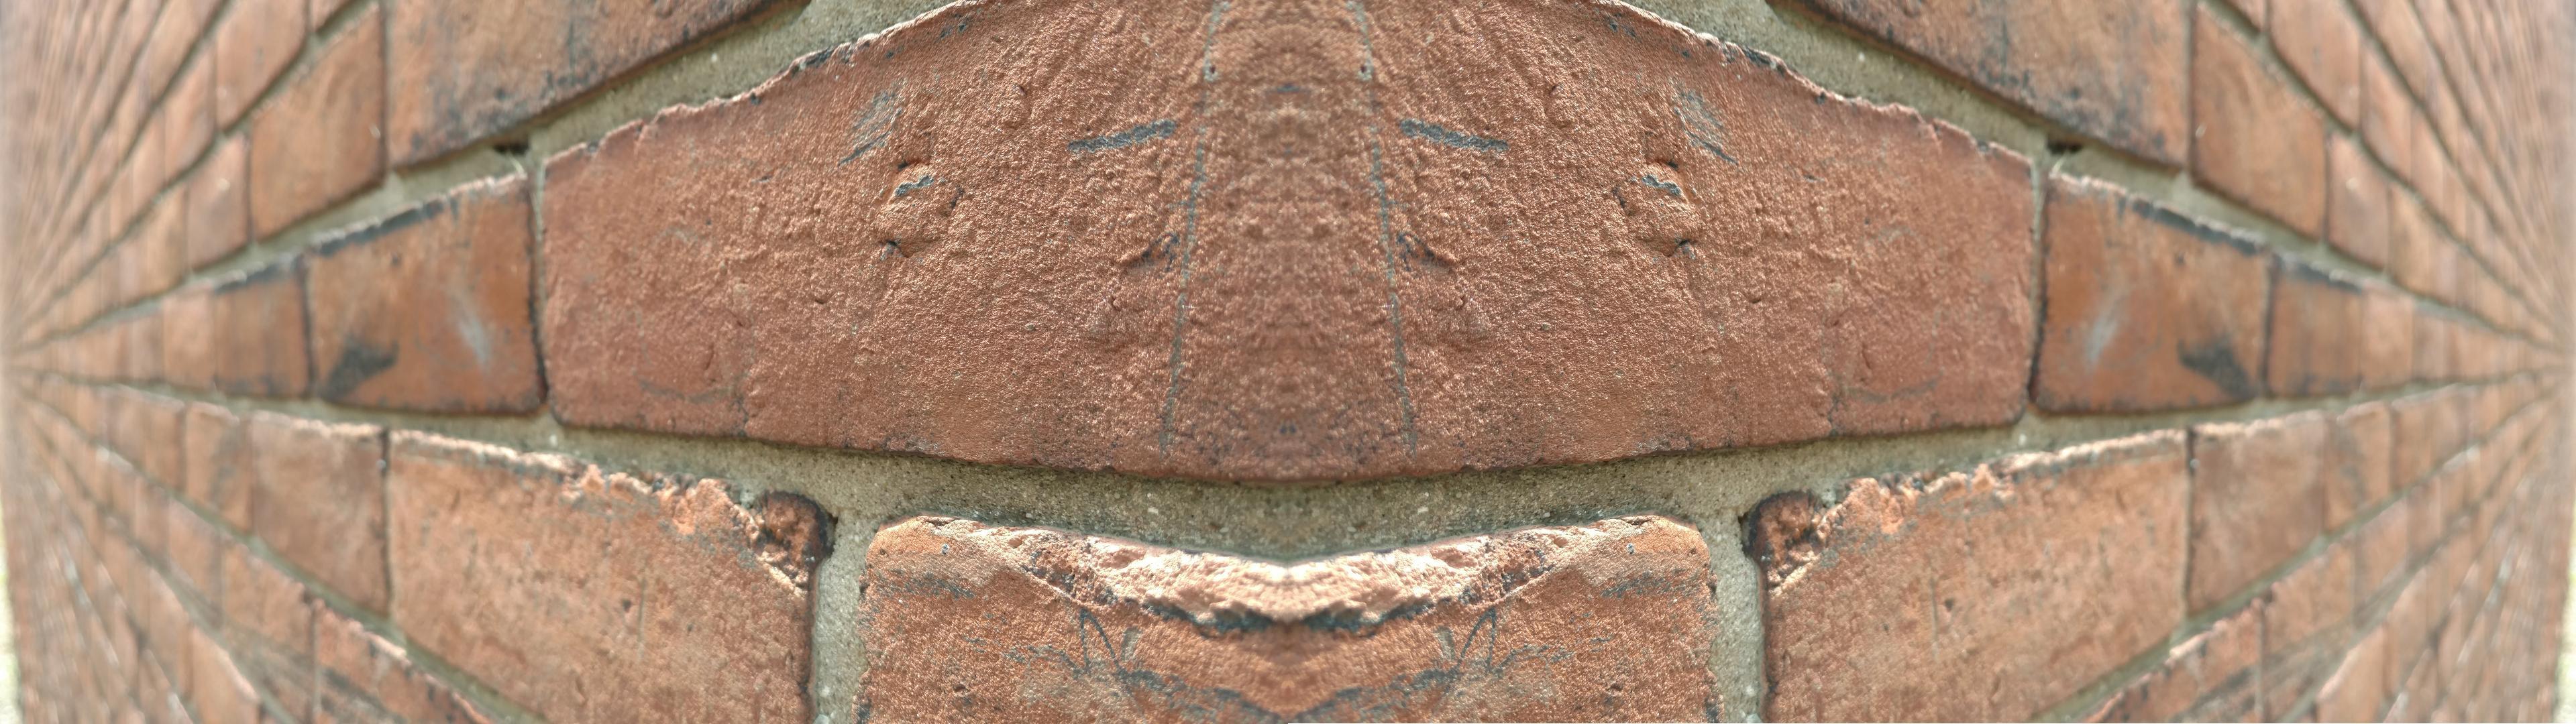 Brick-Wall-cornerized-x-1080-wallpaper-wp3803429